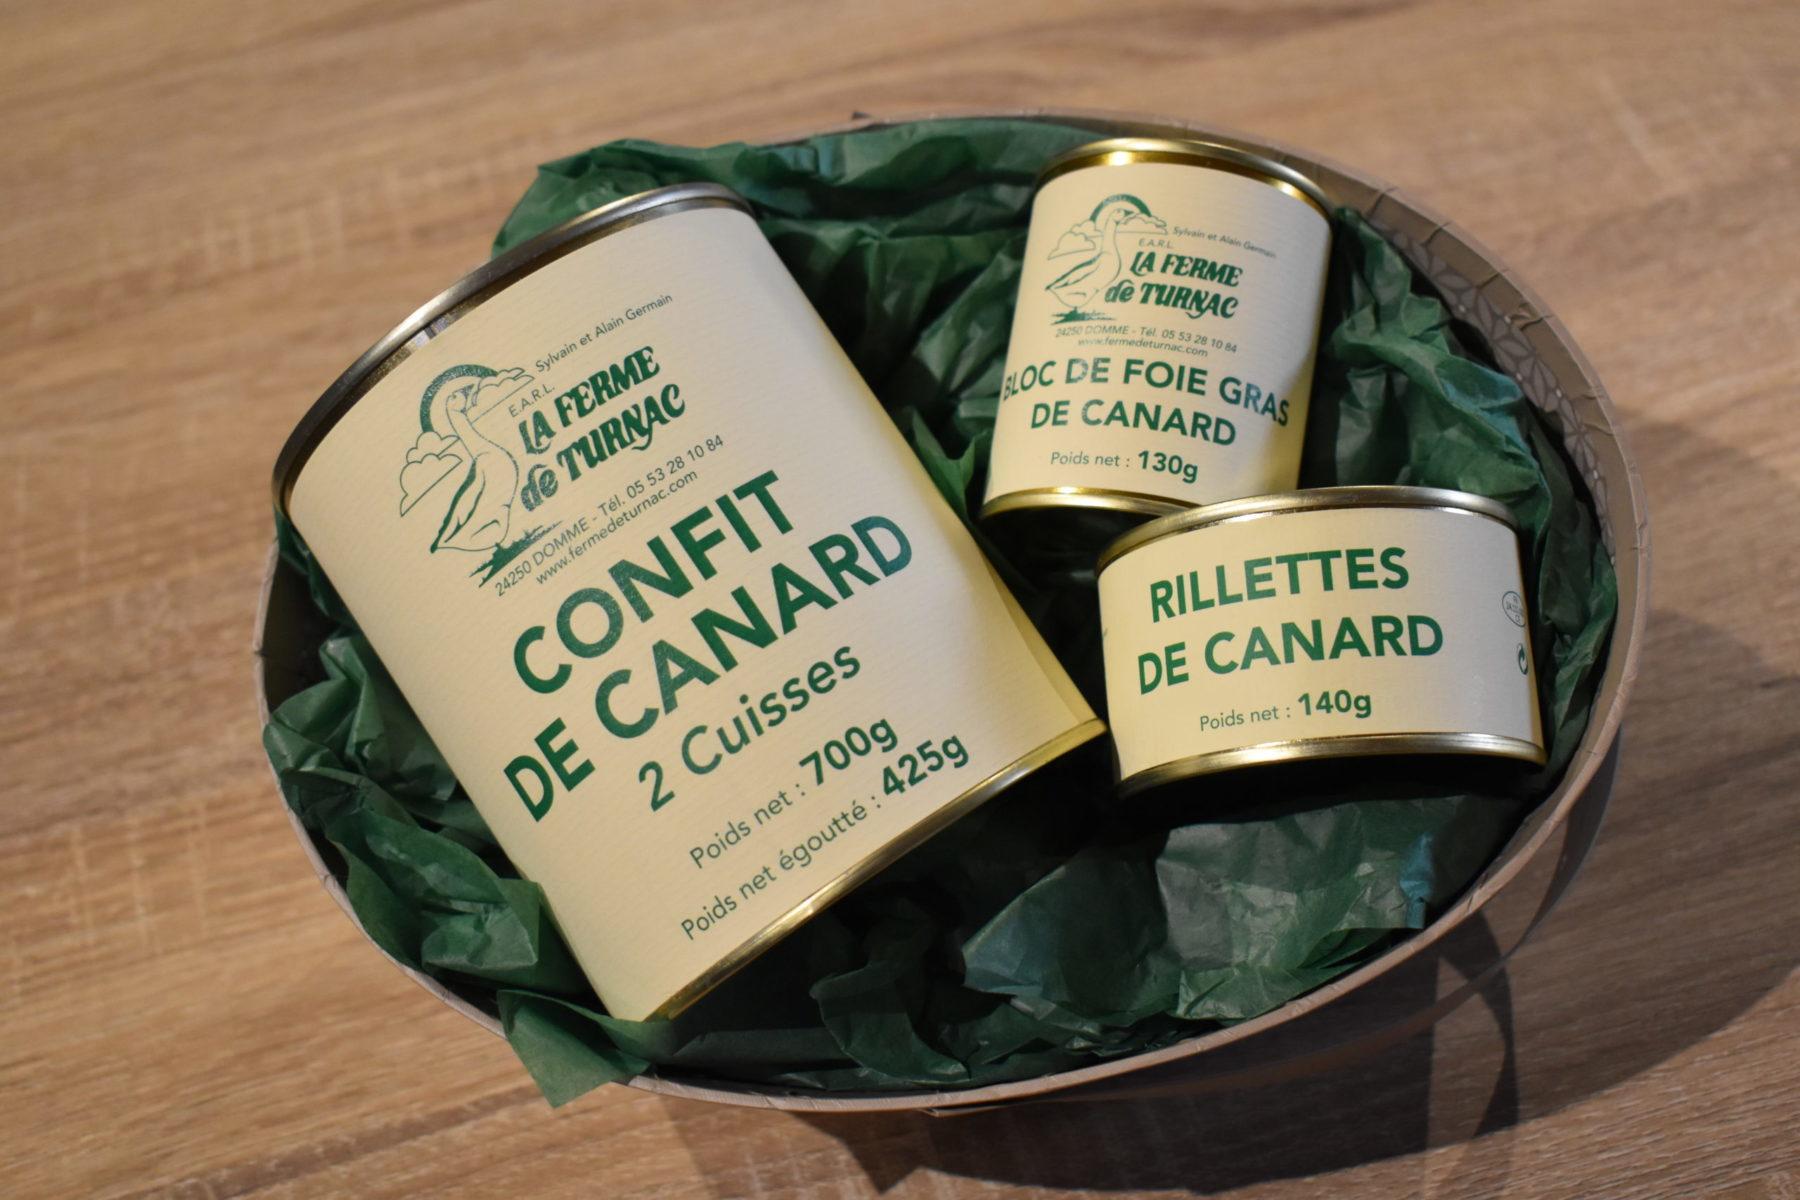 LA FERME DE TURNAC FOIE GRAS DORDOGNE Coffret Gourmandise.jpg 391